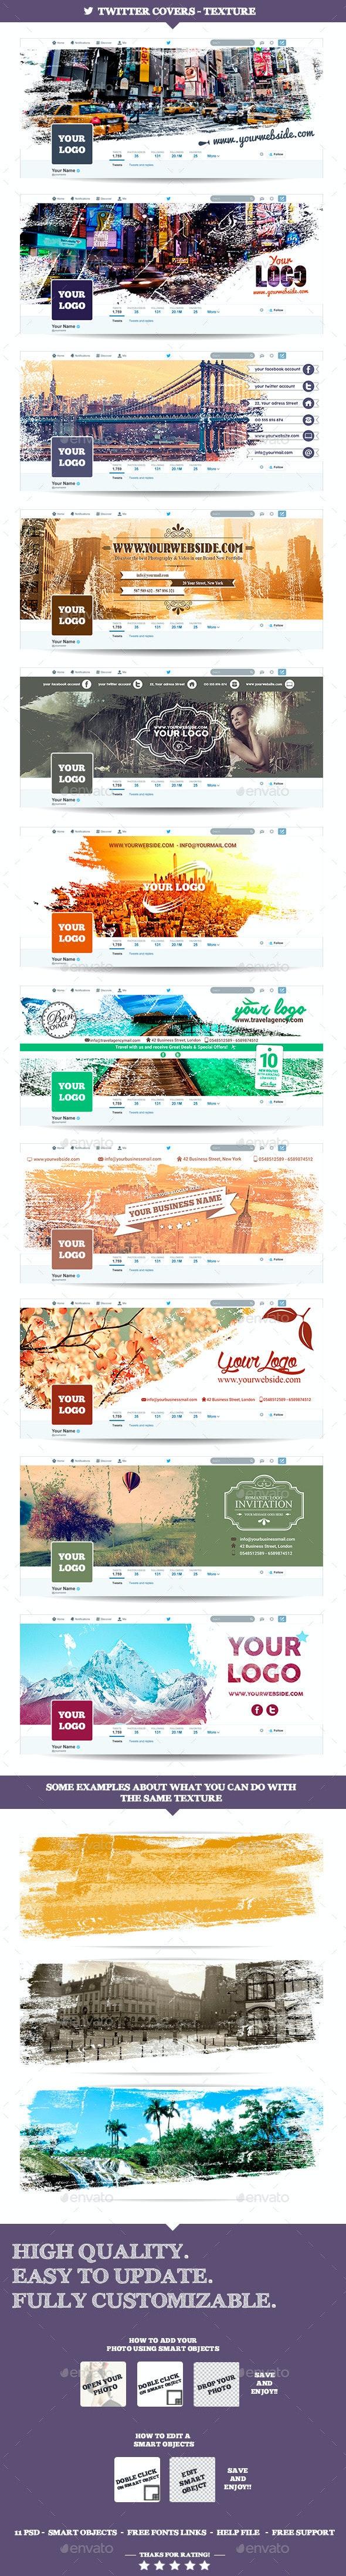 Twitter Covers - Texture - Twitter Social Media